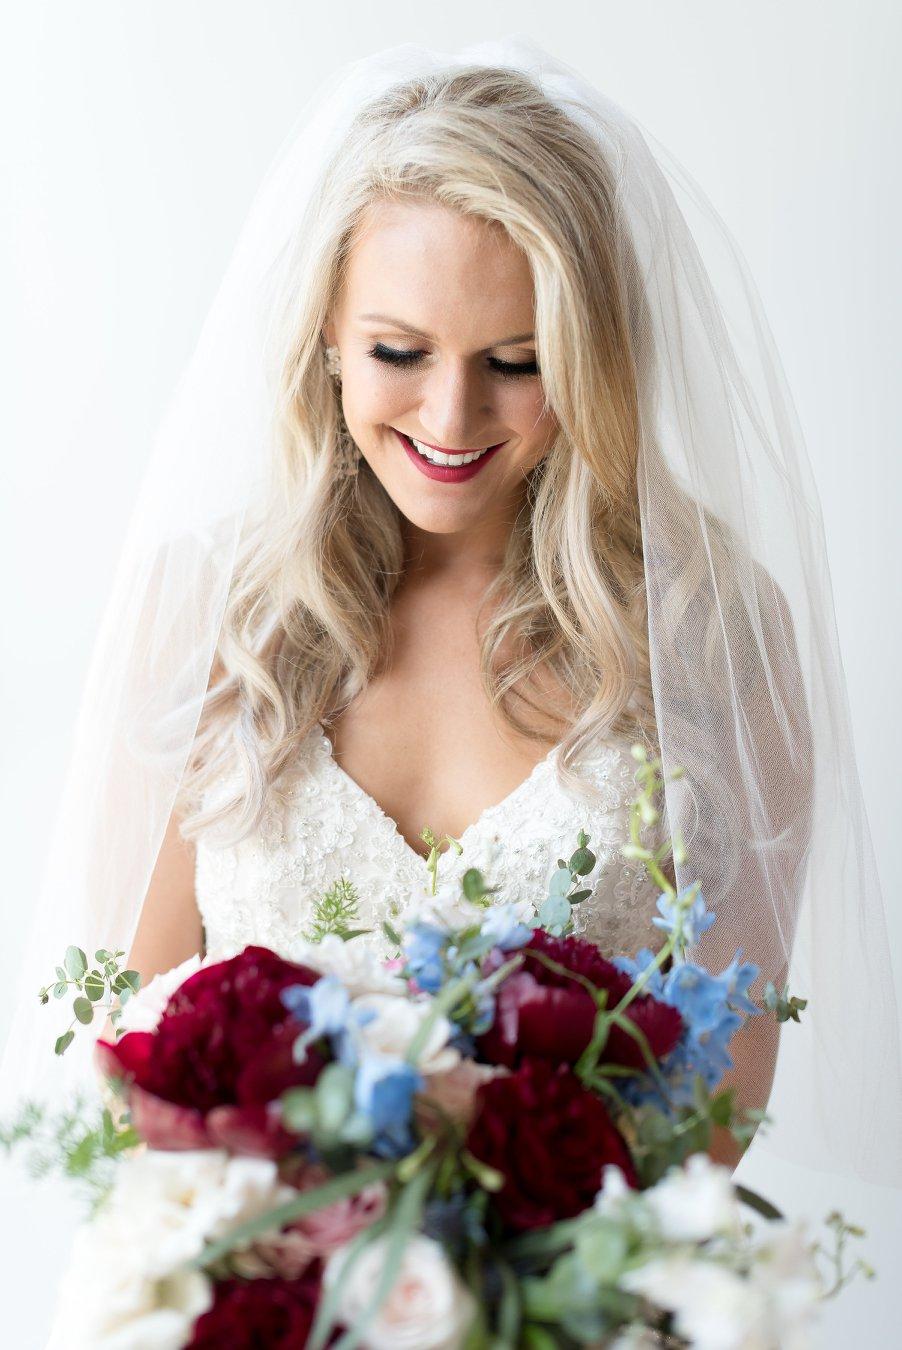 Photo by Kacey Gilpin Weddings